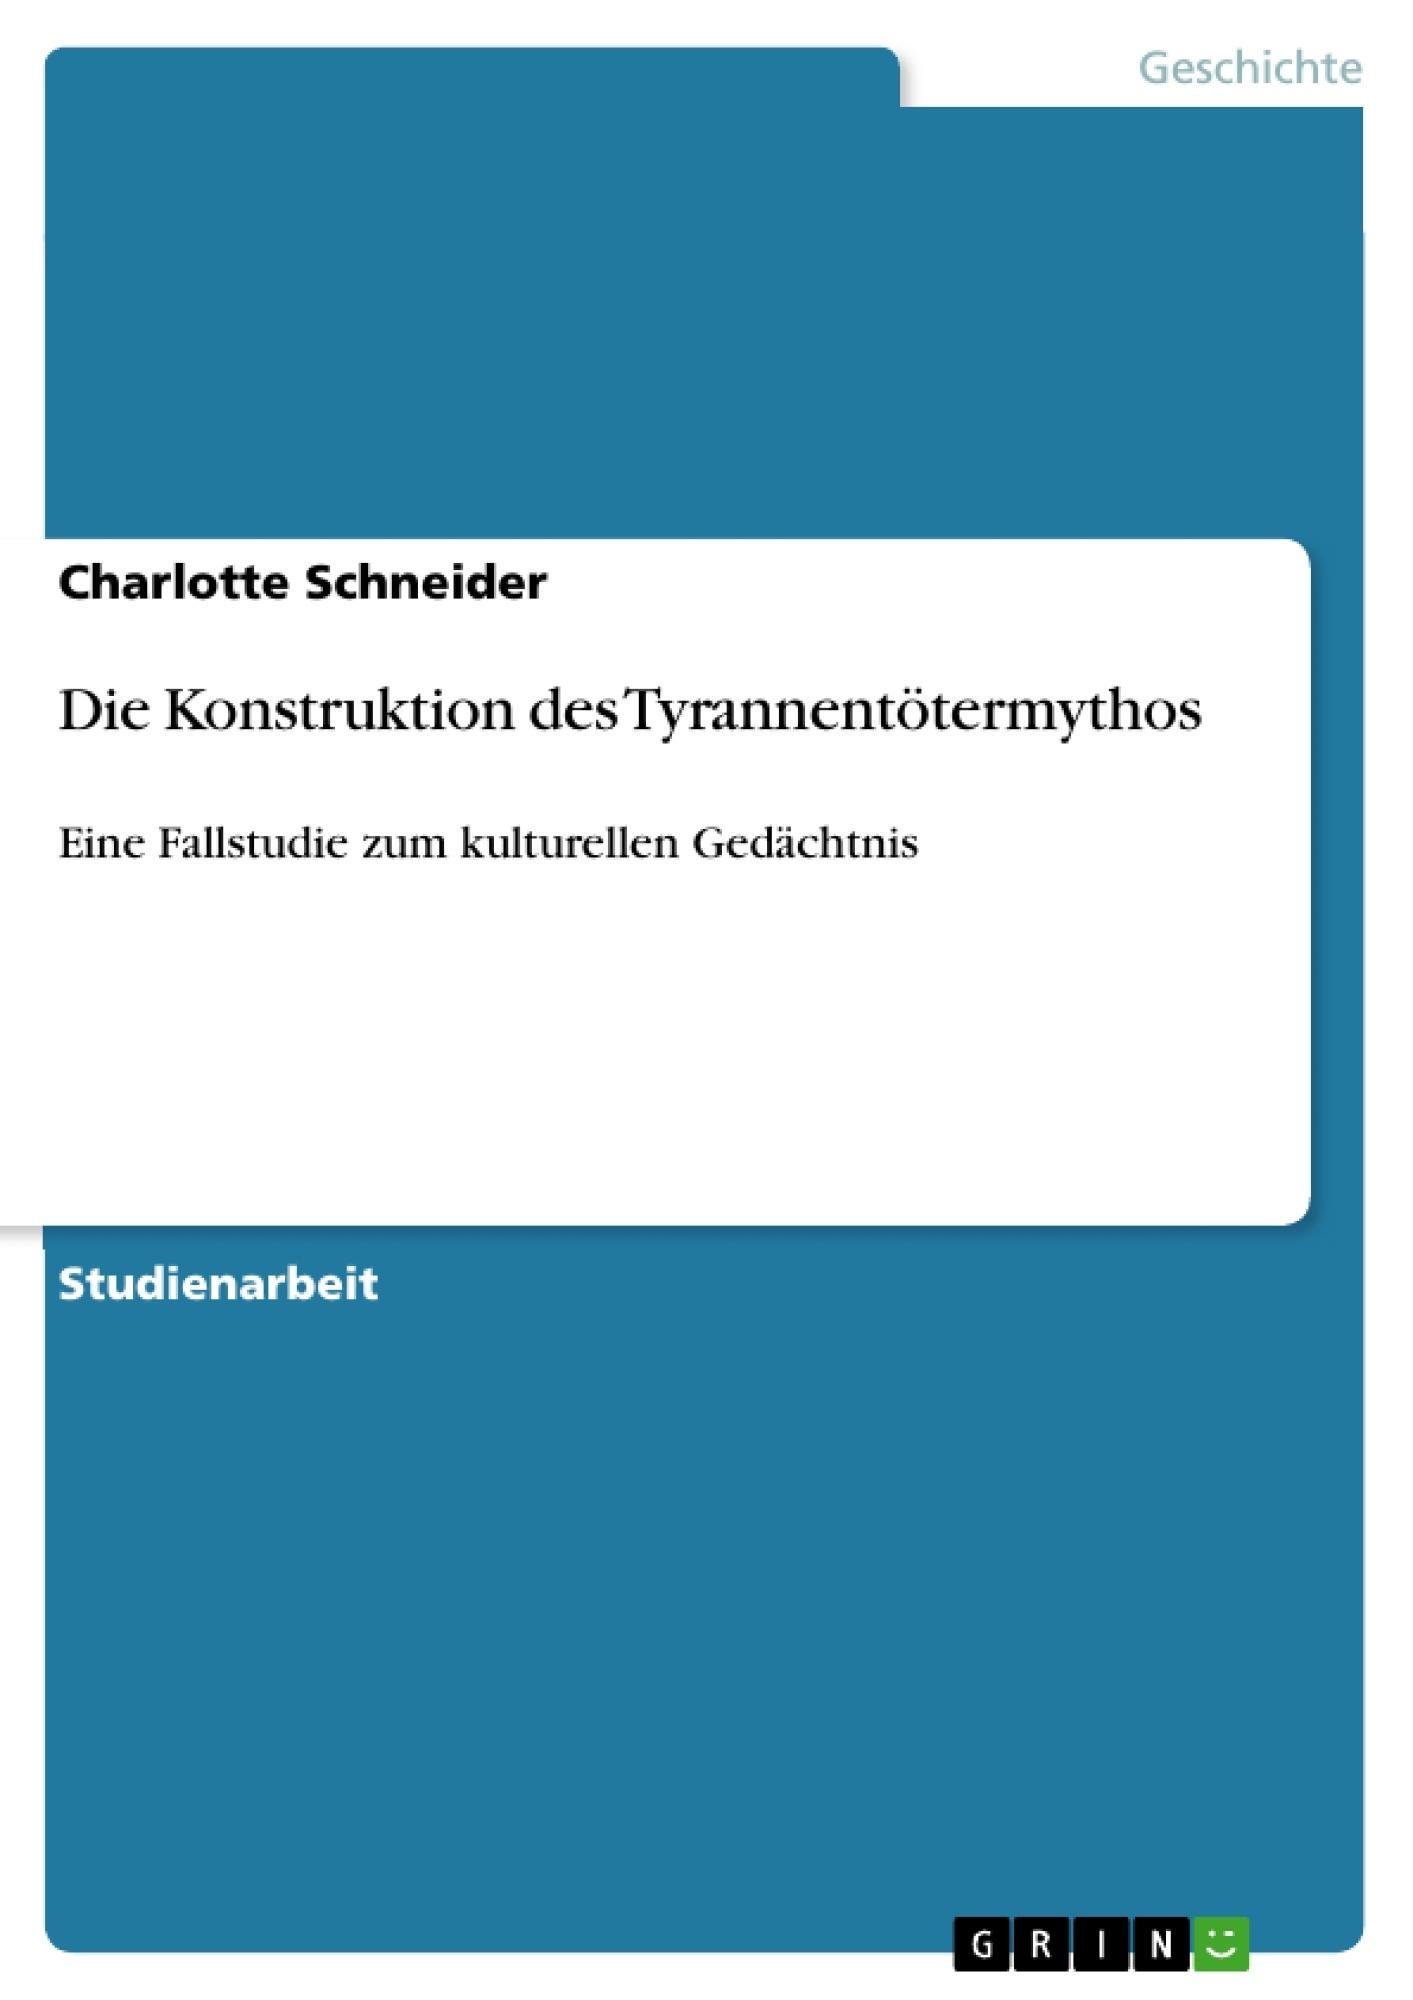 Titel: Die Konstruktion des Tyrannentötermythos